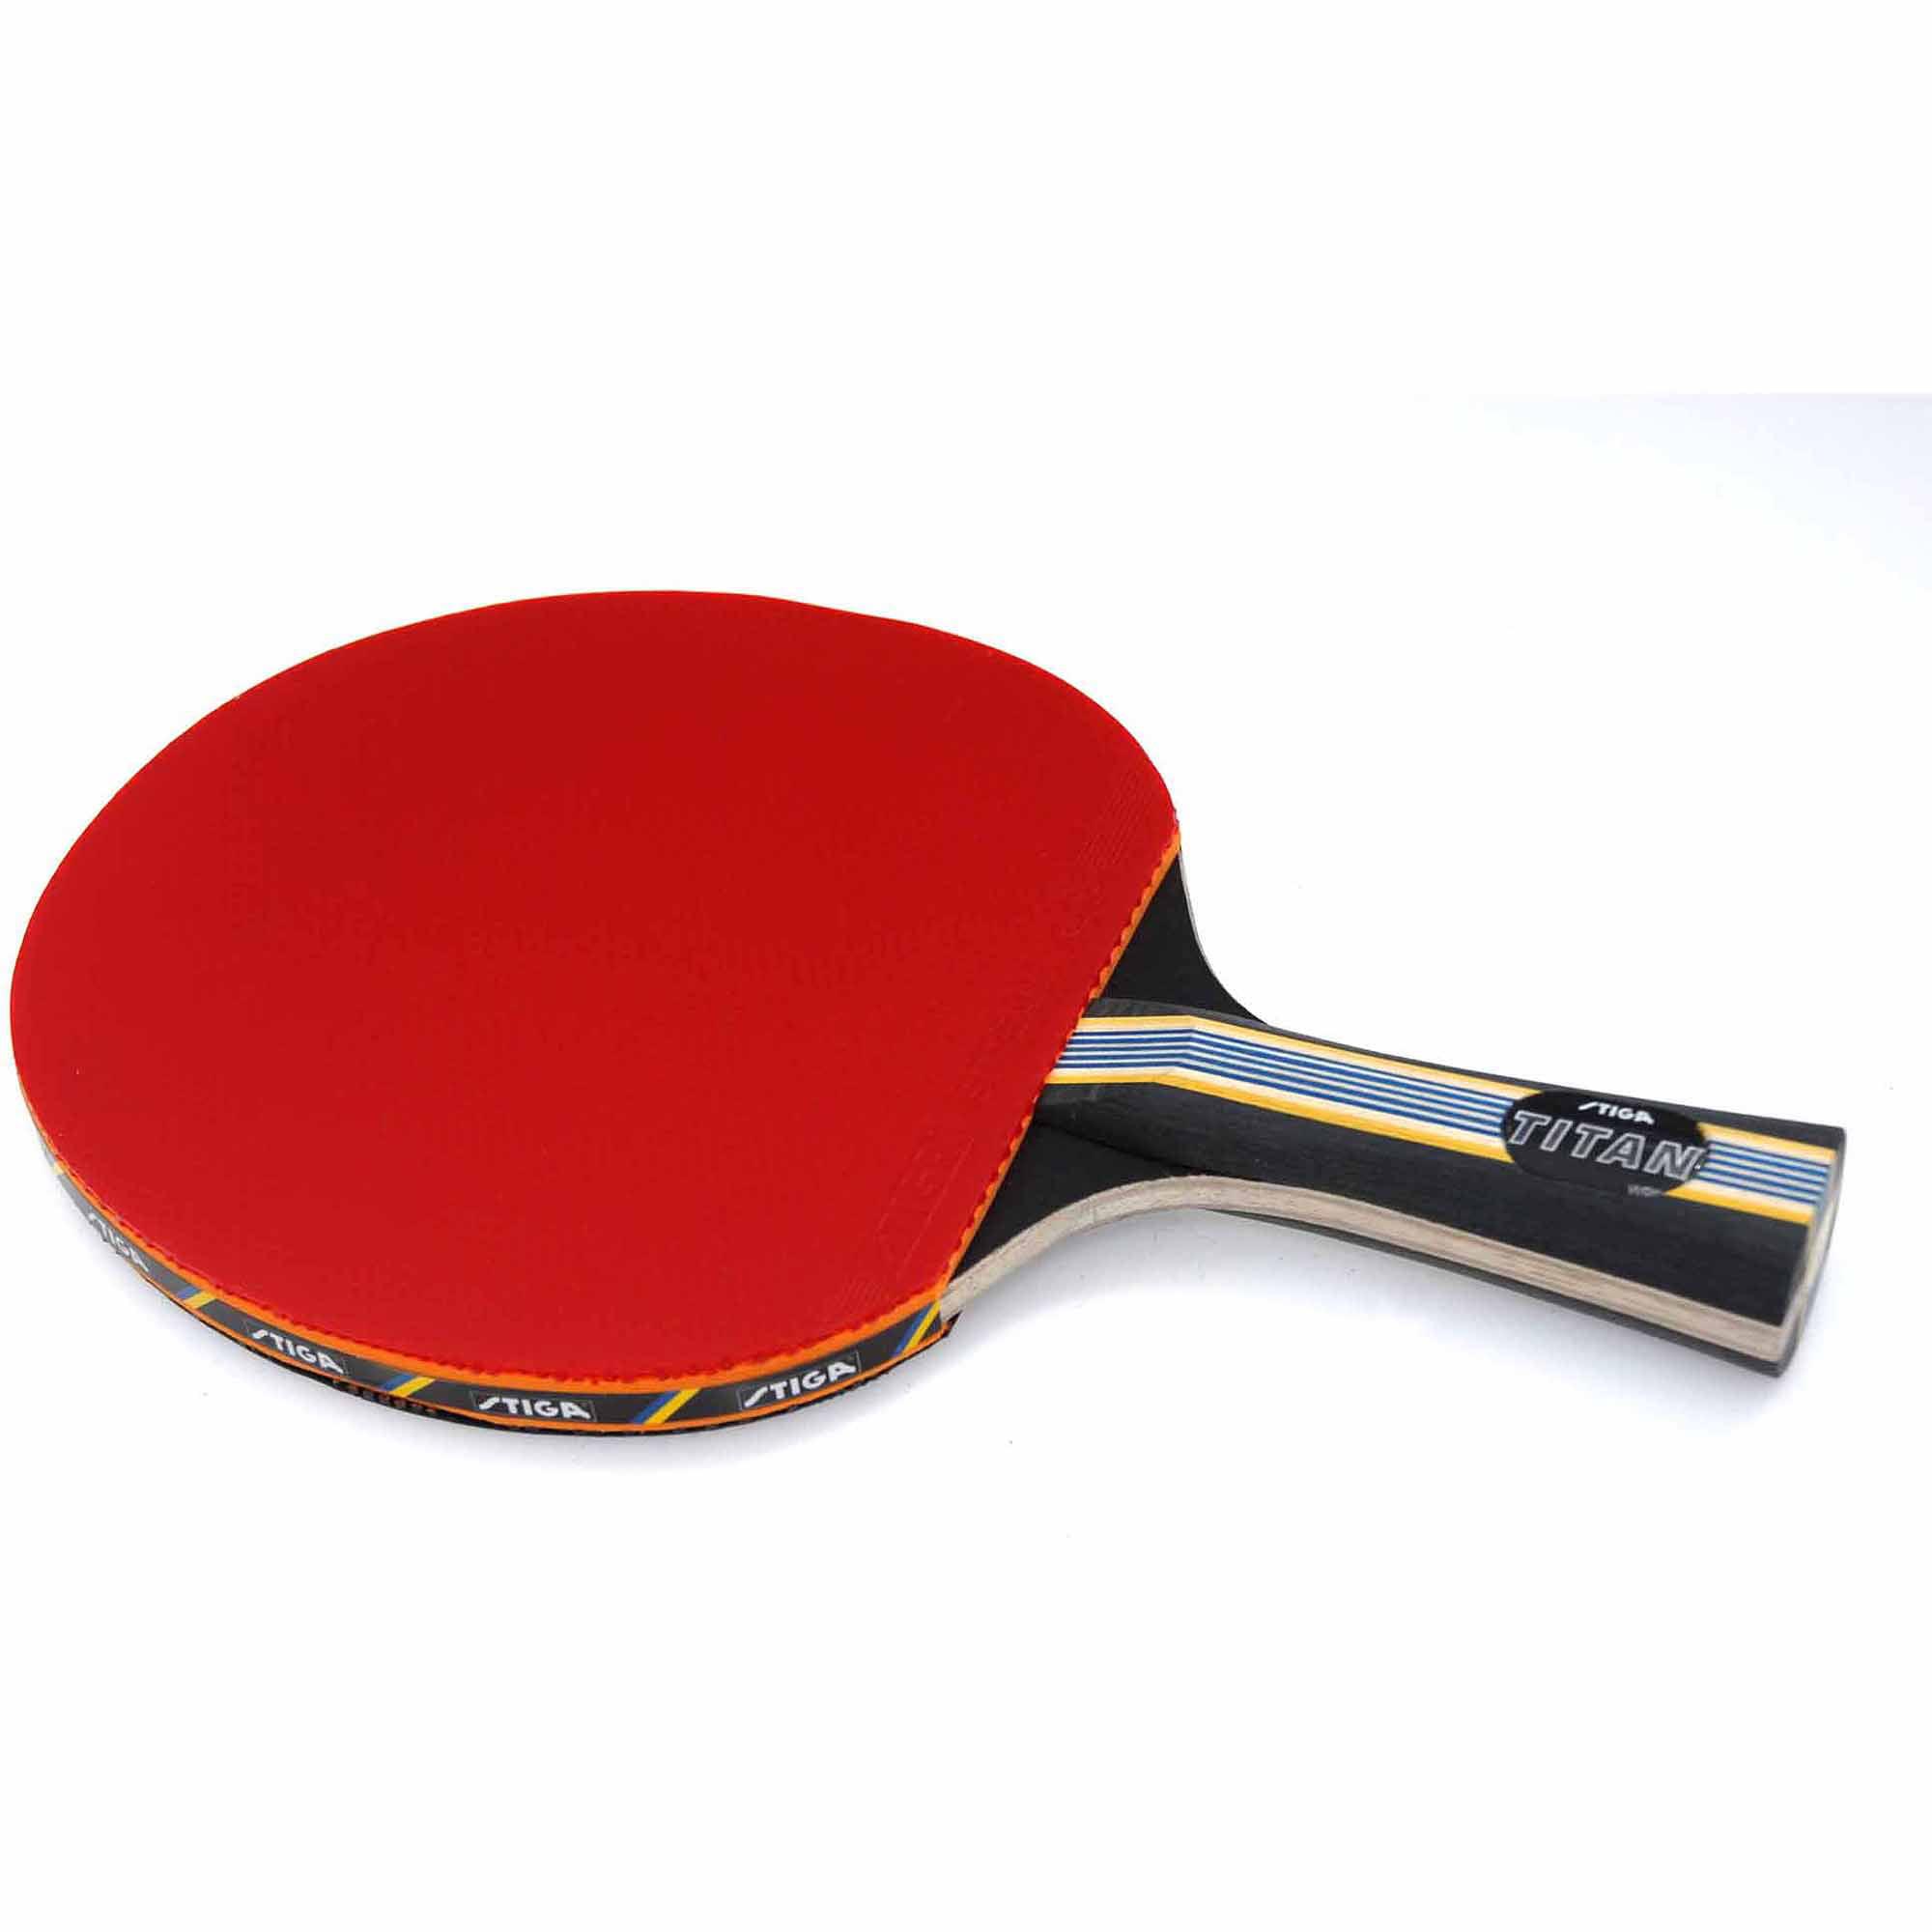 Stiga Evolution Table Tennis Racket Stiga Evolution Table